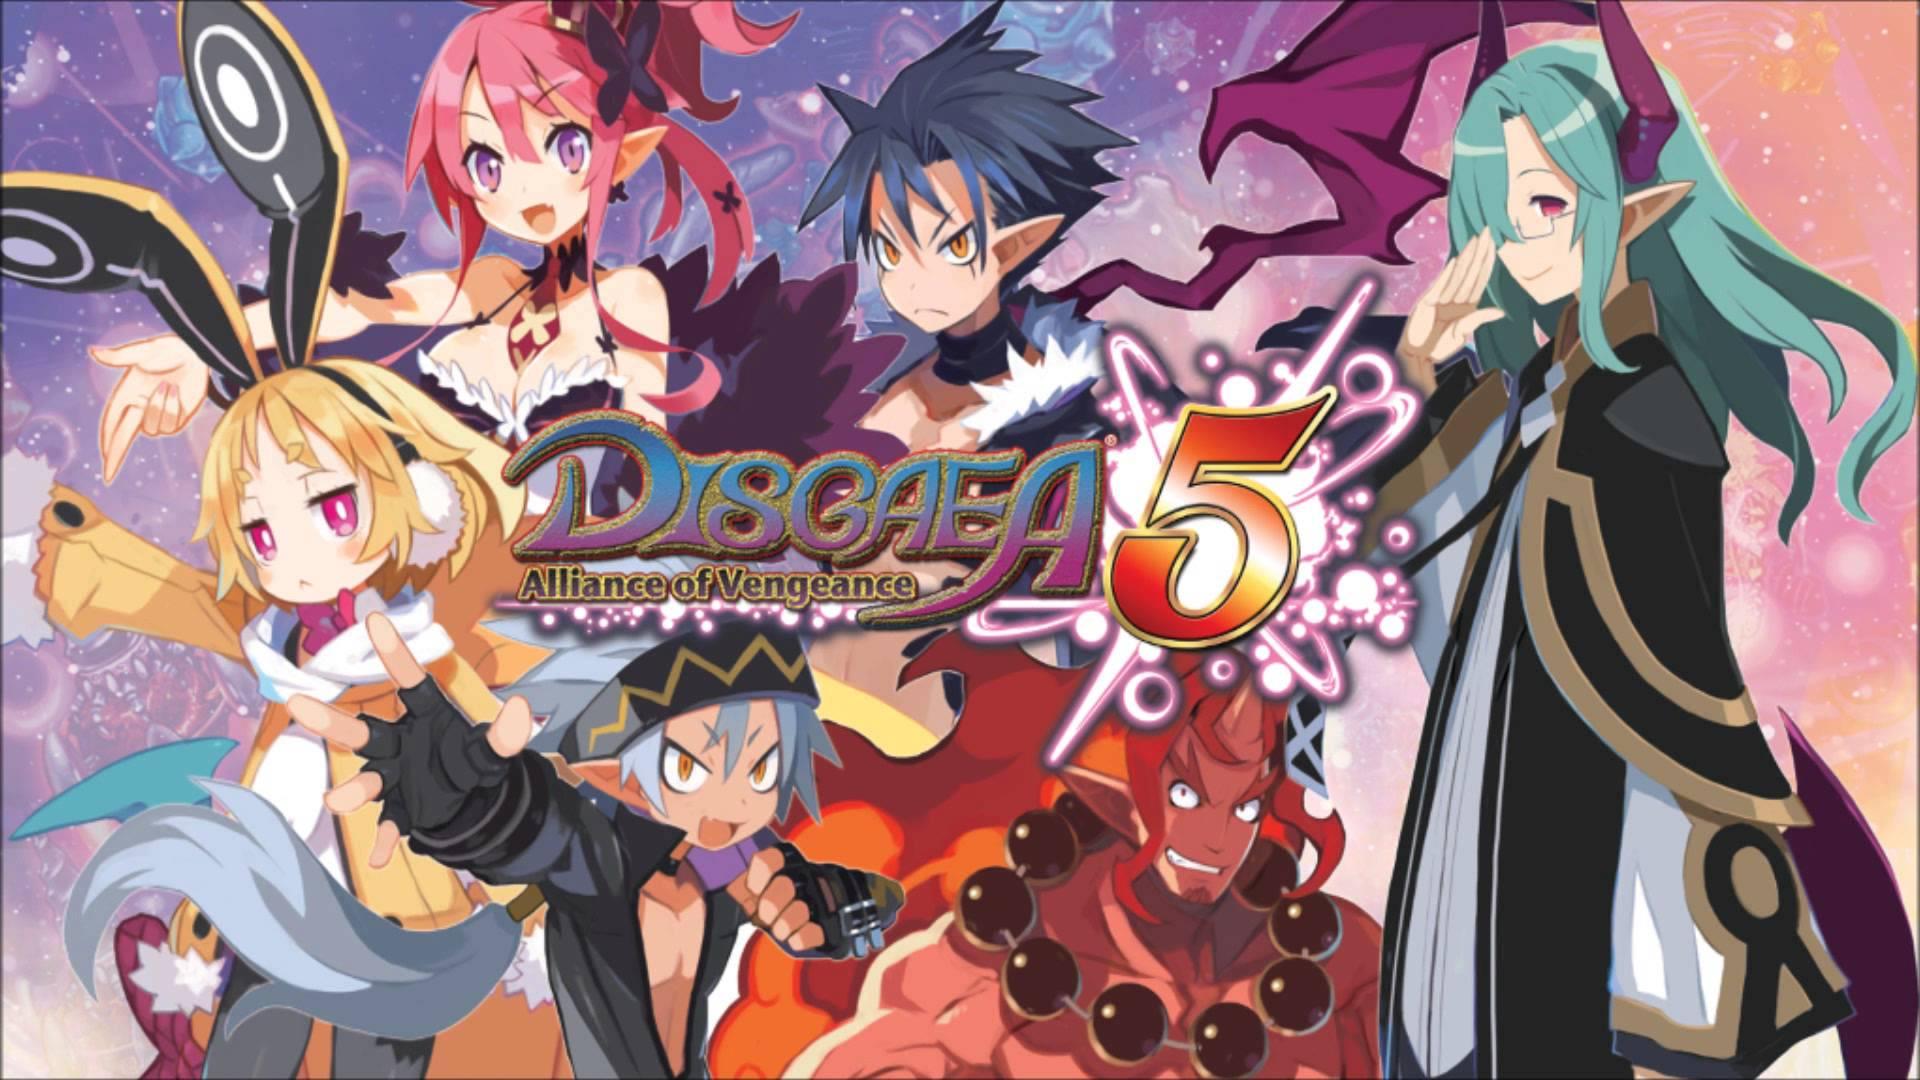 4 Disgaea 5 Alliance Of Vengeance HD Wallpapers